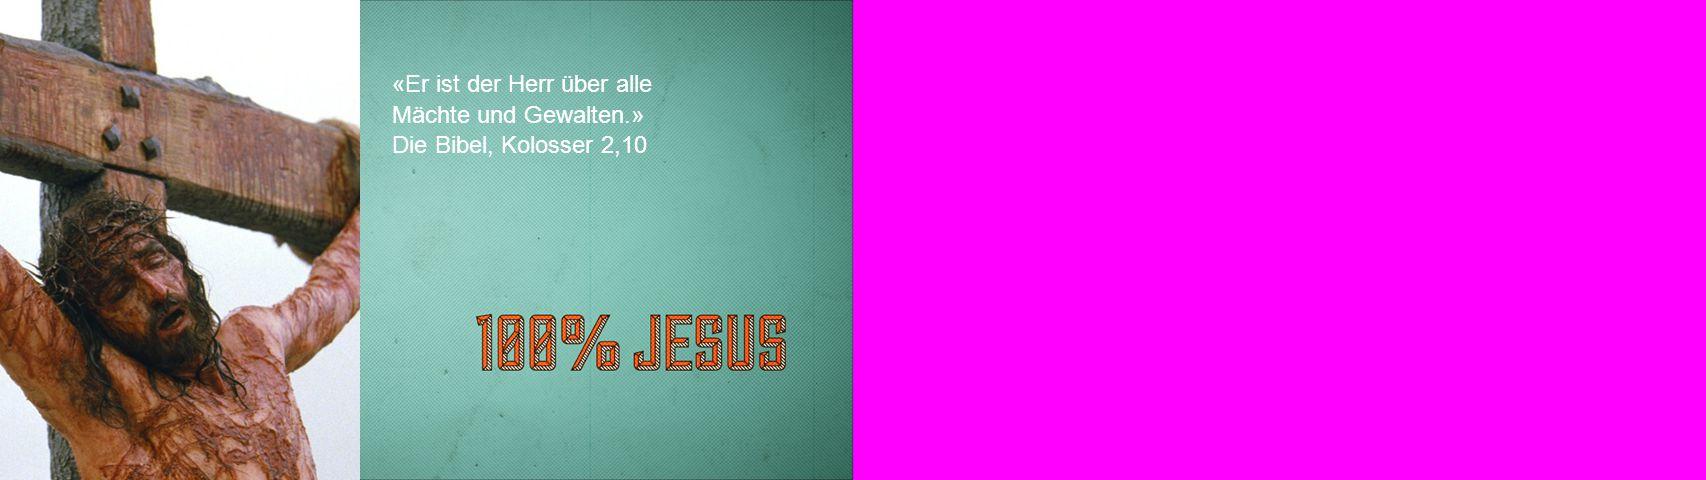 «Er ist der Herr über alle